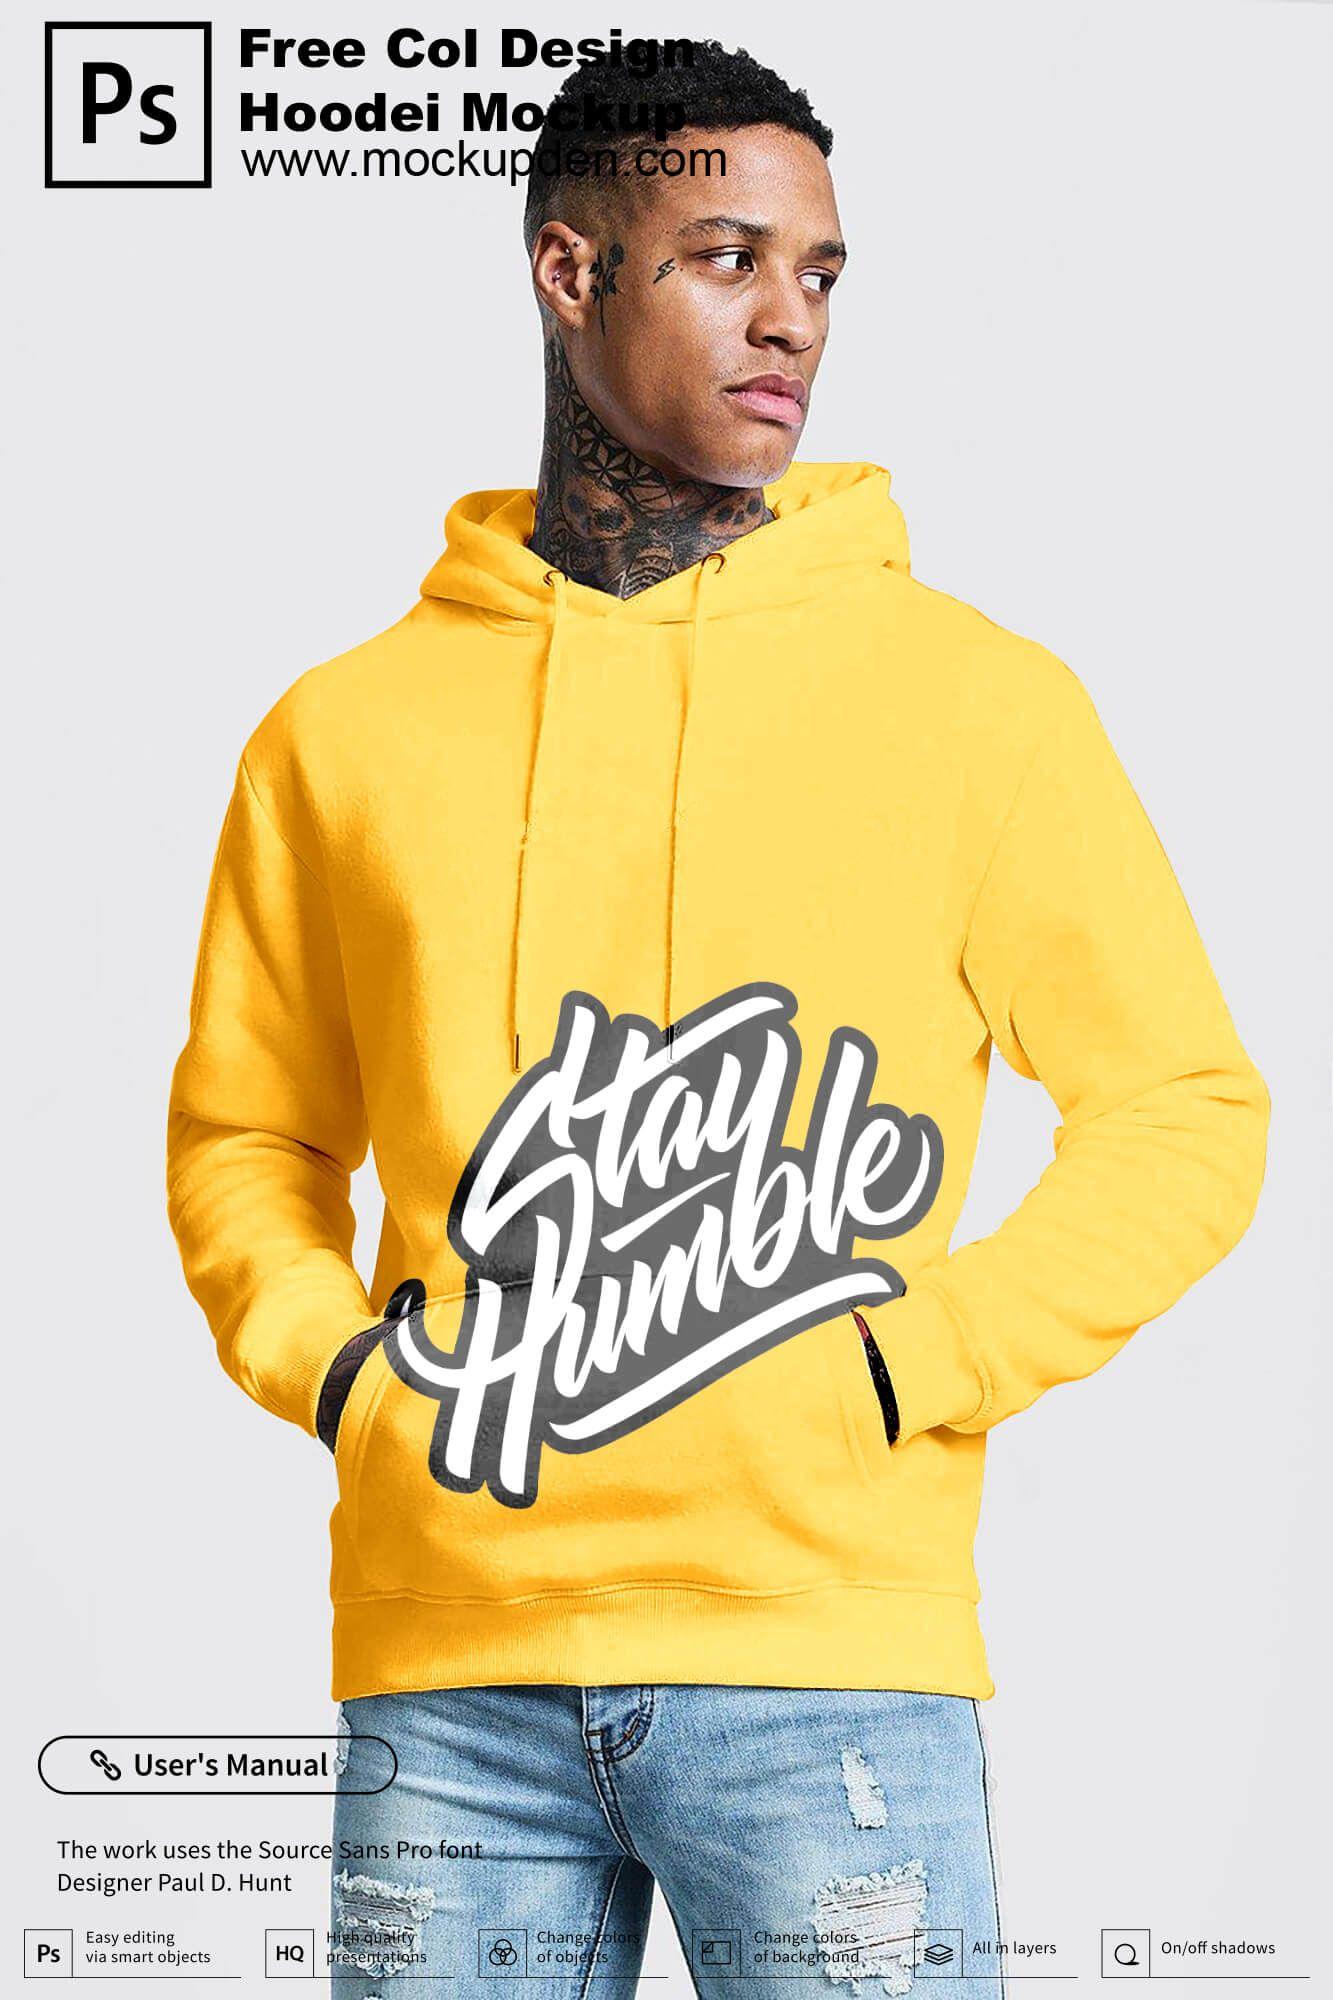 Download Free Cool Design Hoodie Mockup Psd Template Hoodie Mockup Hoodie Mockup Free Hoodie Design